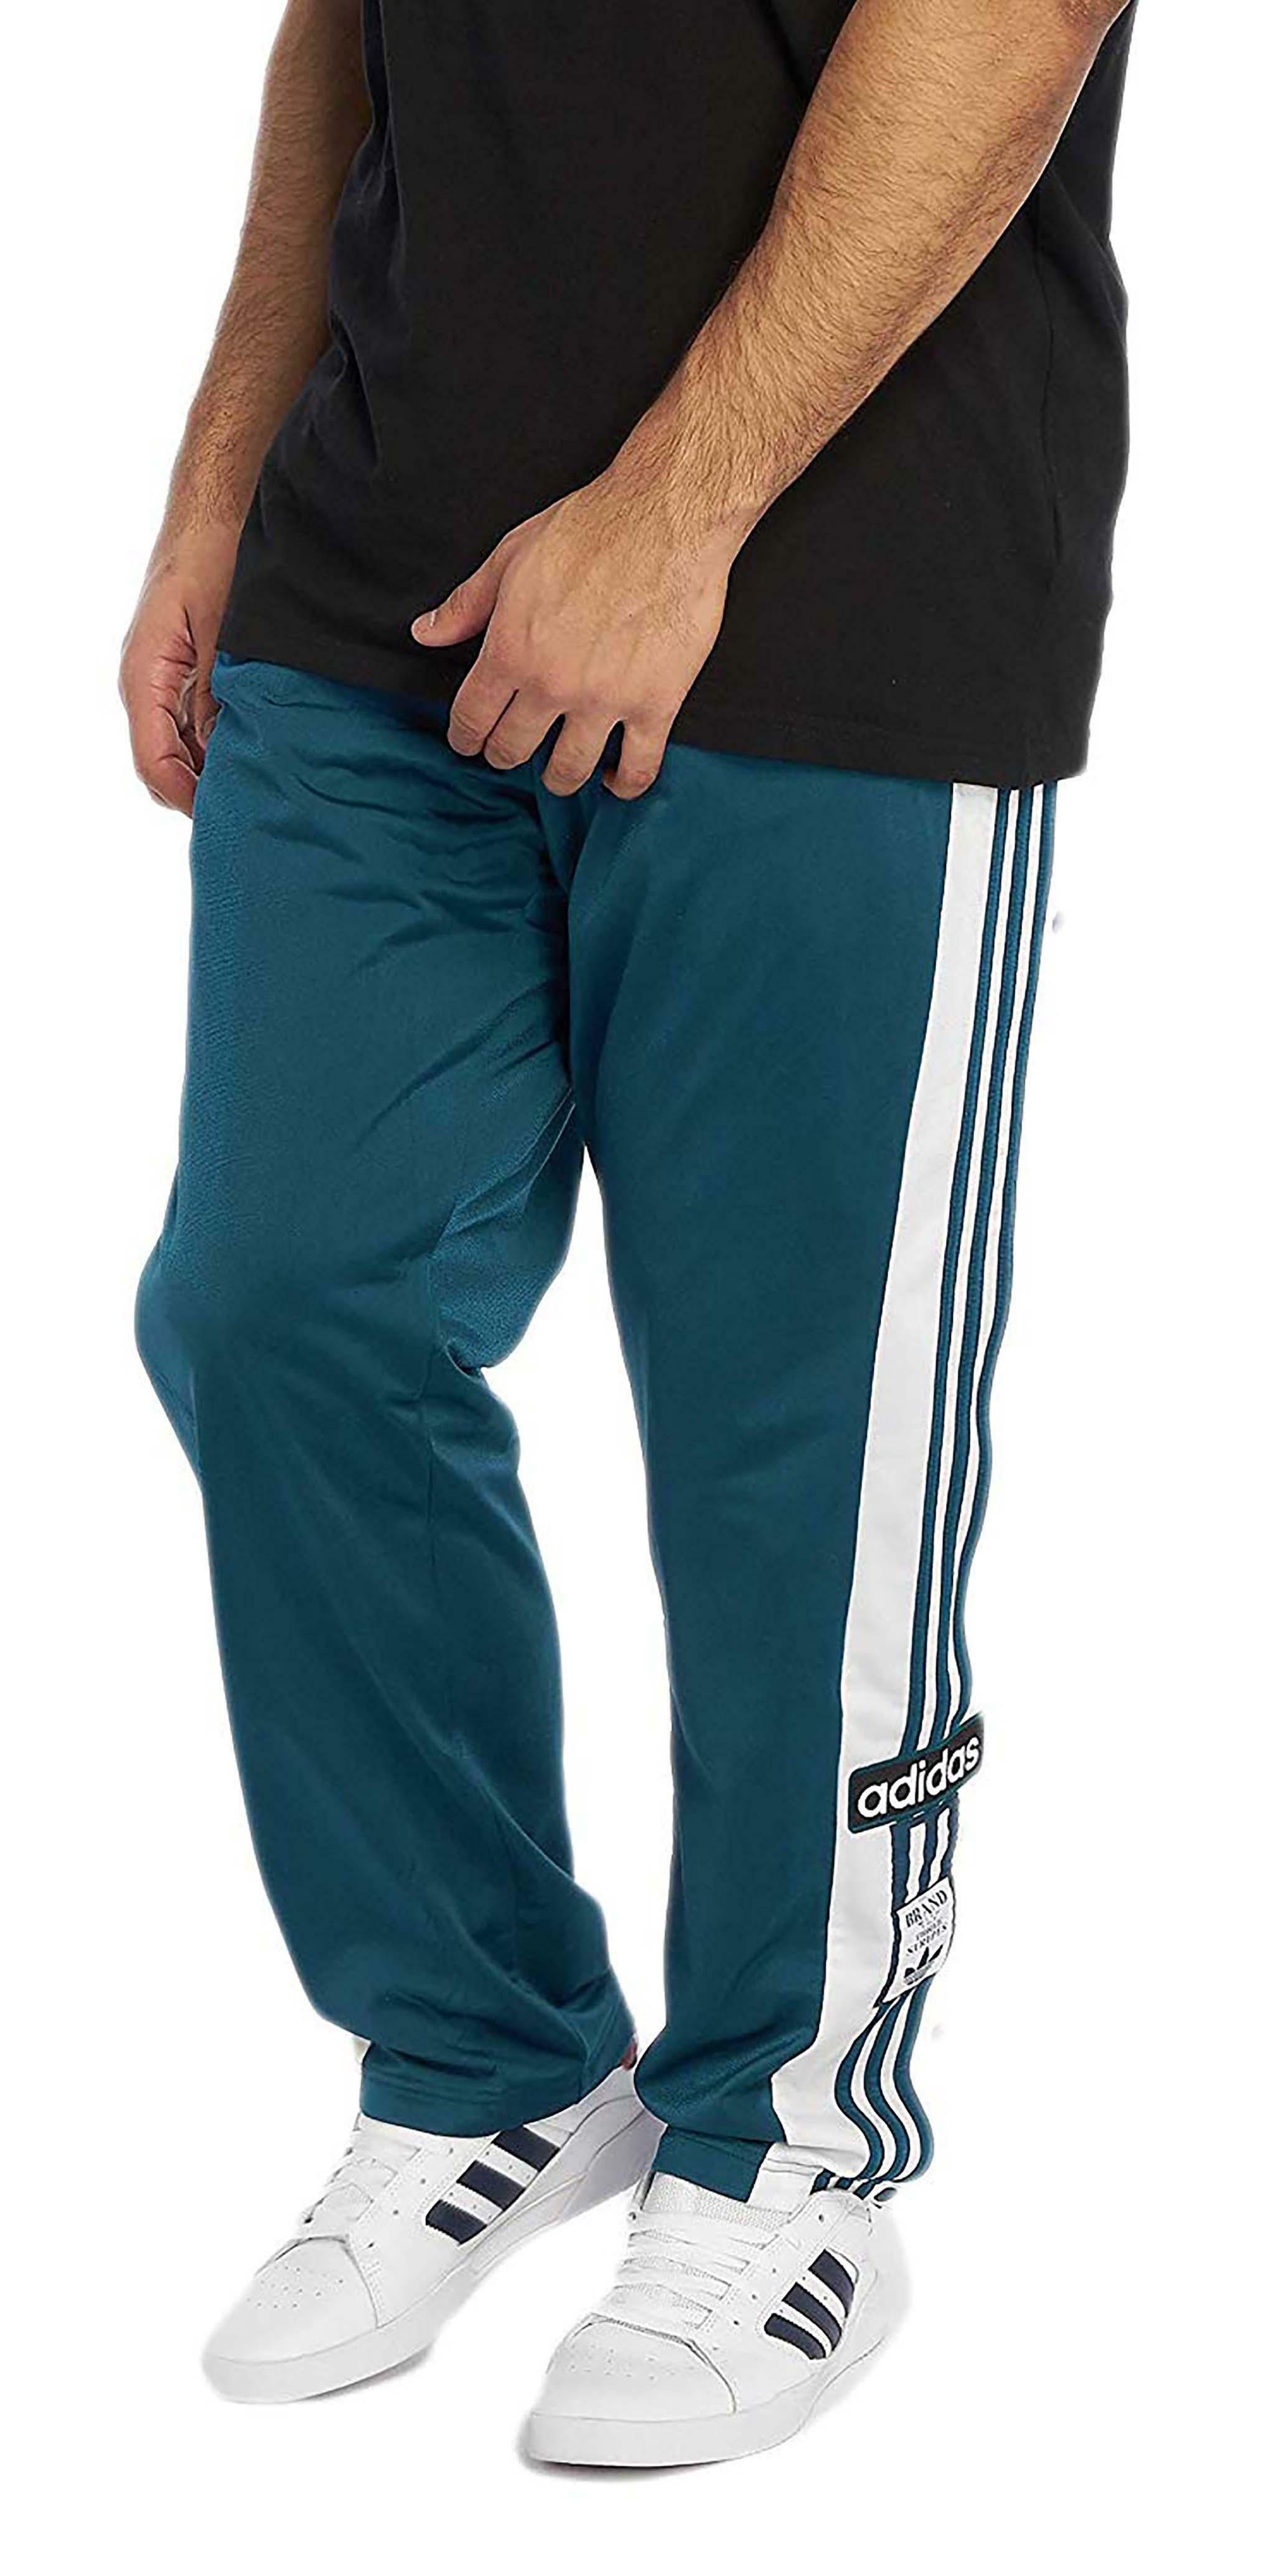 adidas snap pants uomo